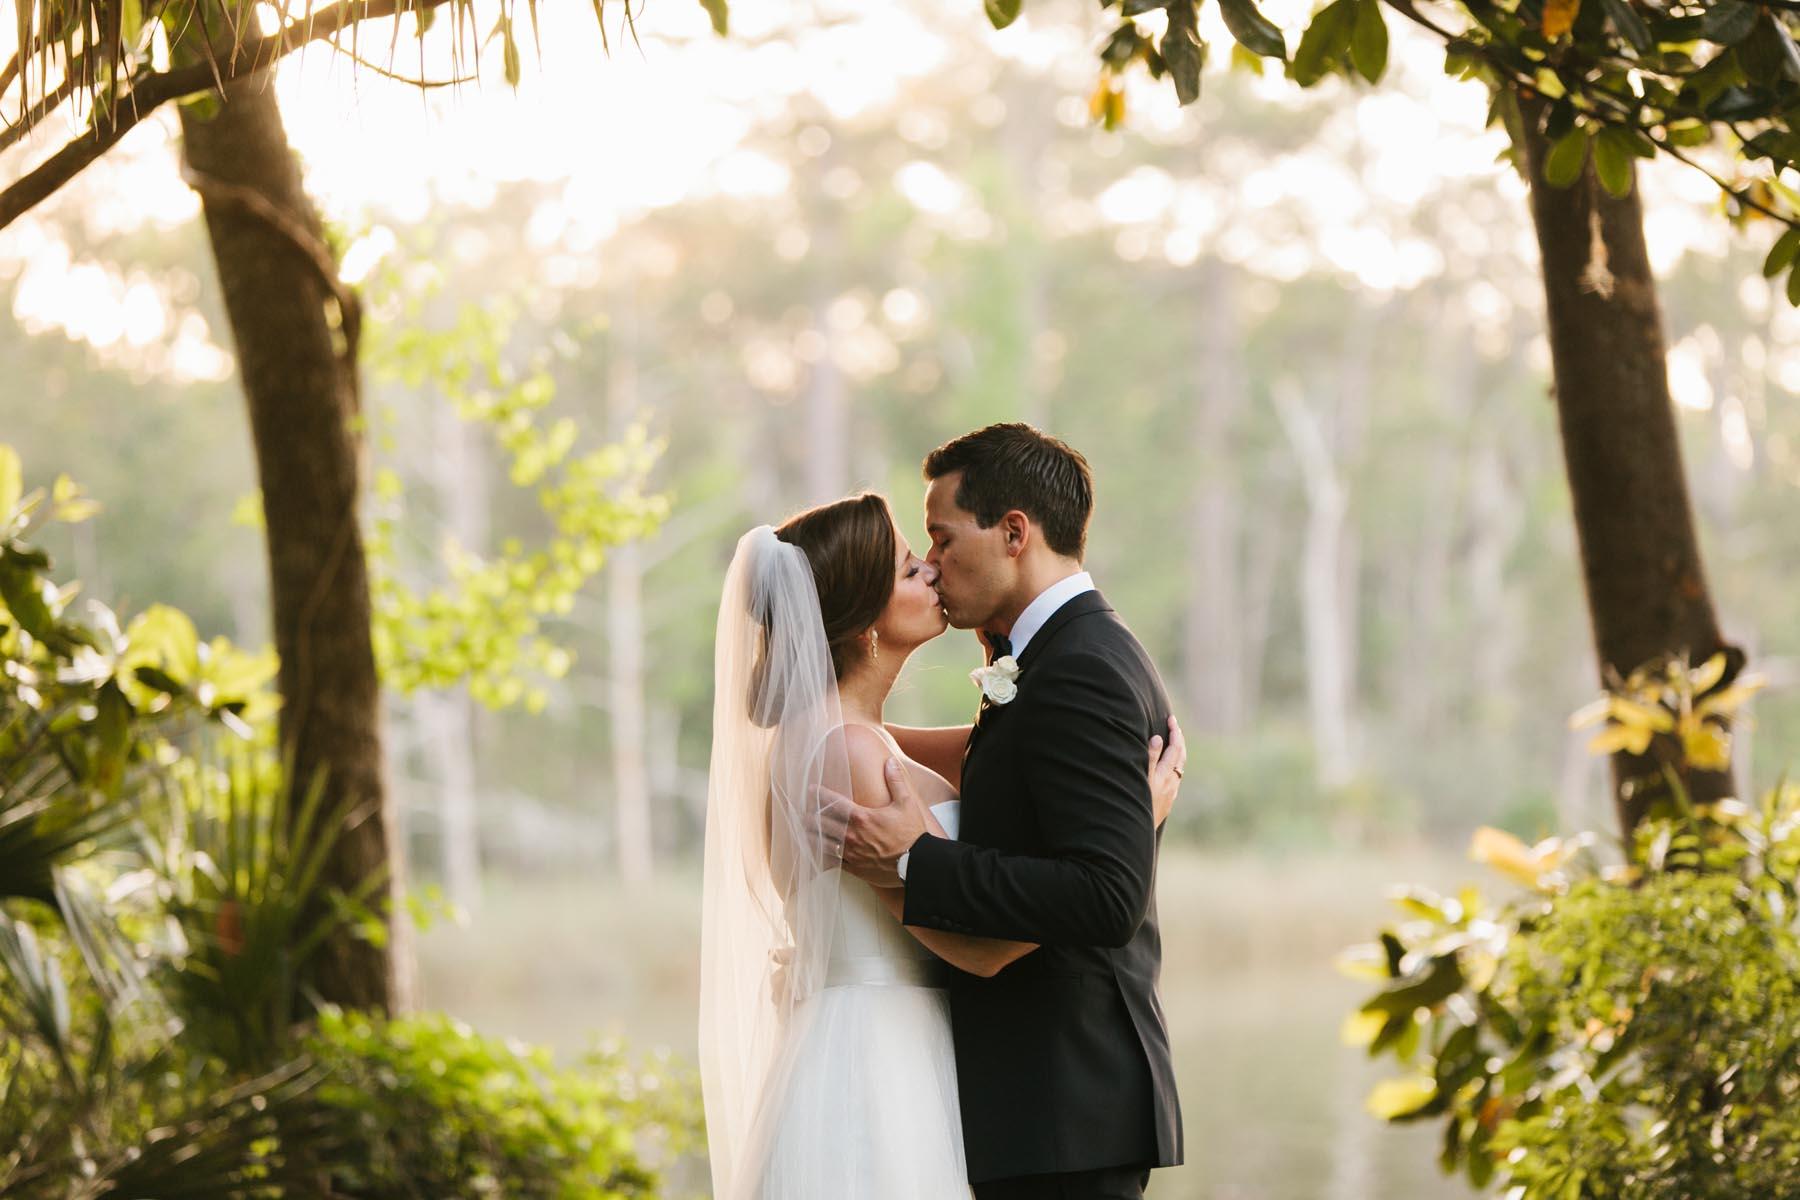 lowry wedding blog eden garden florida wedding-100